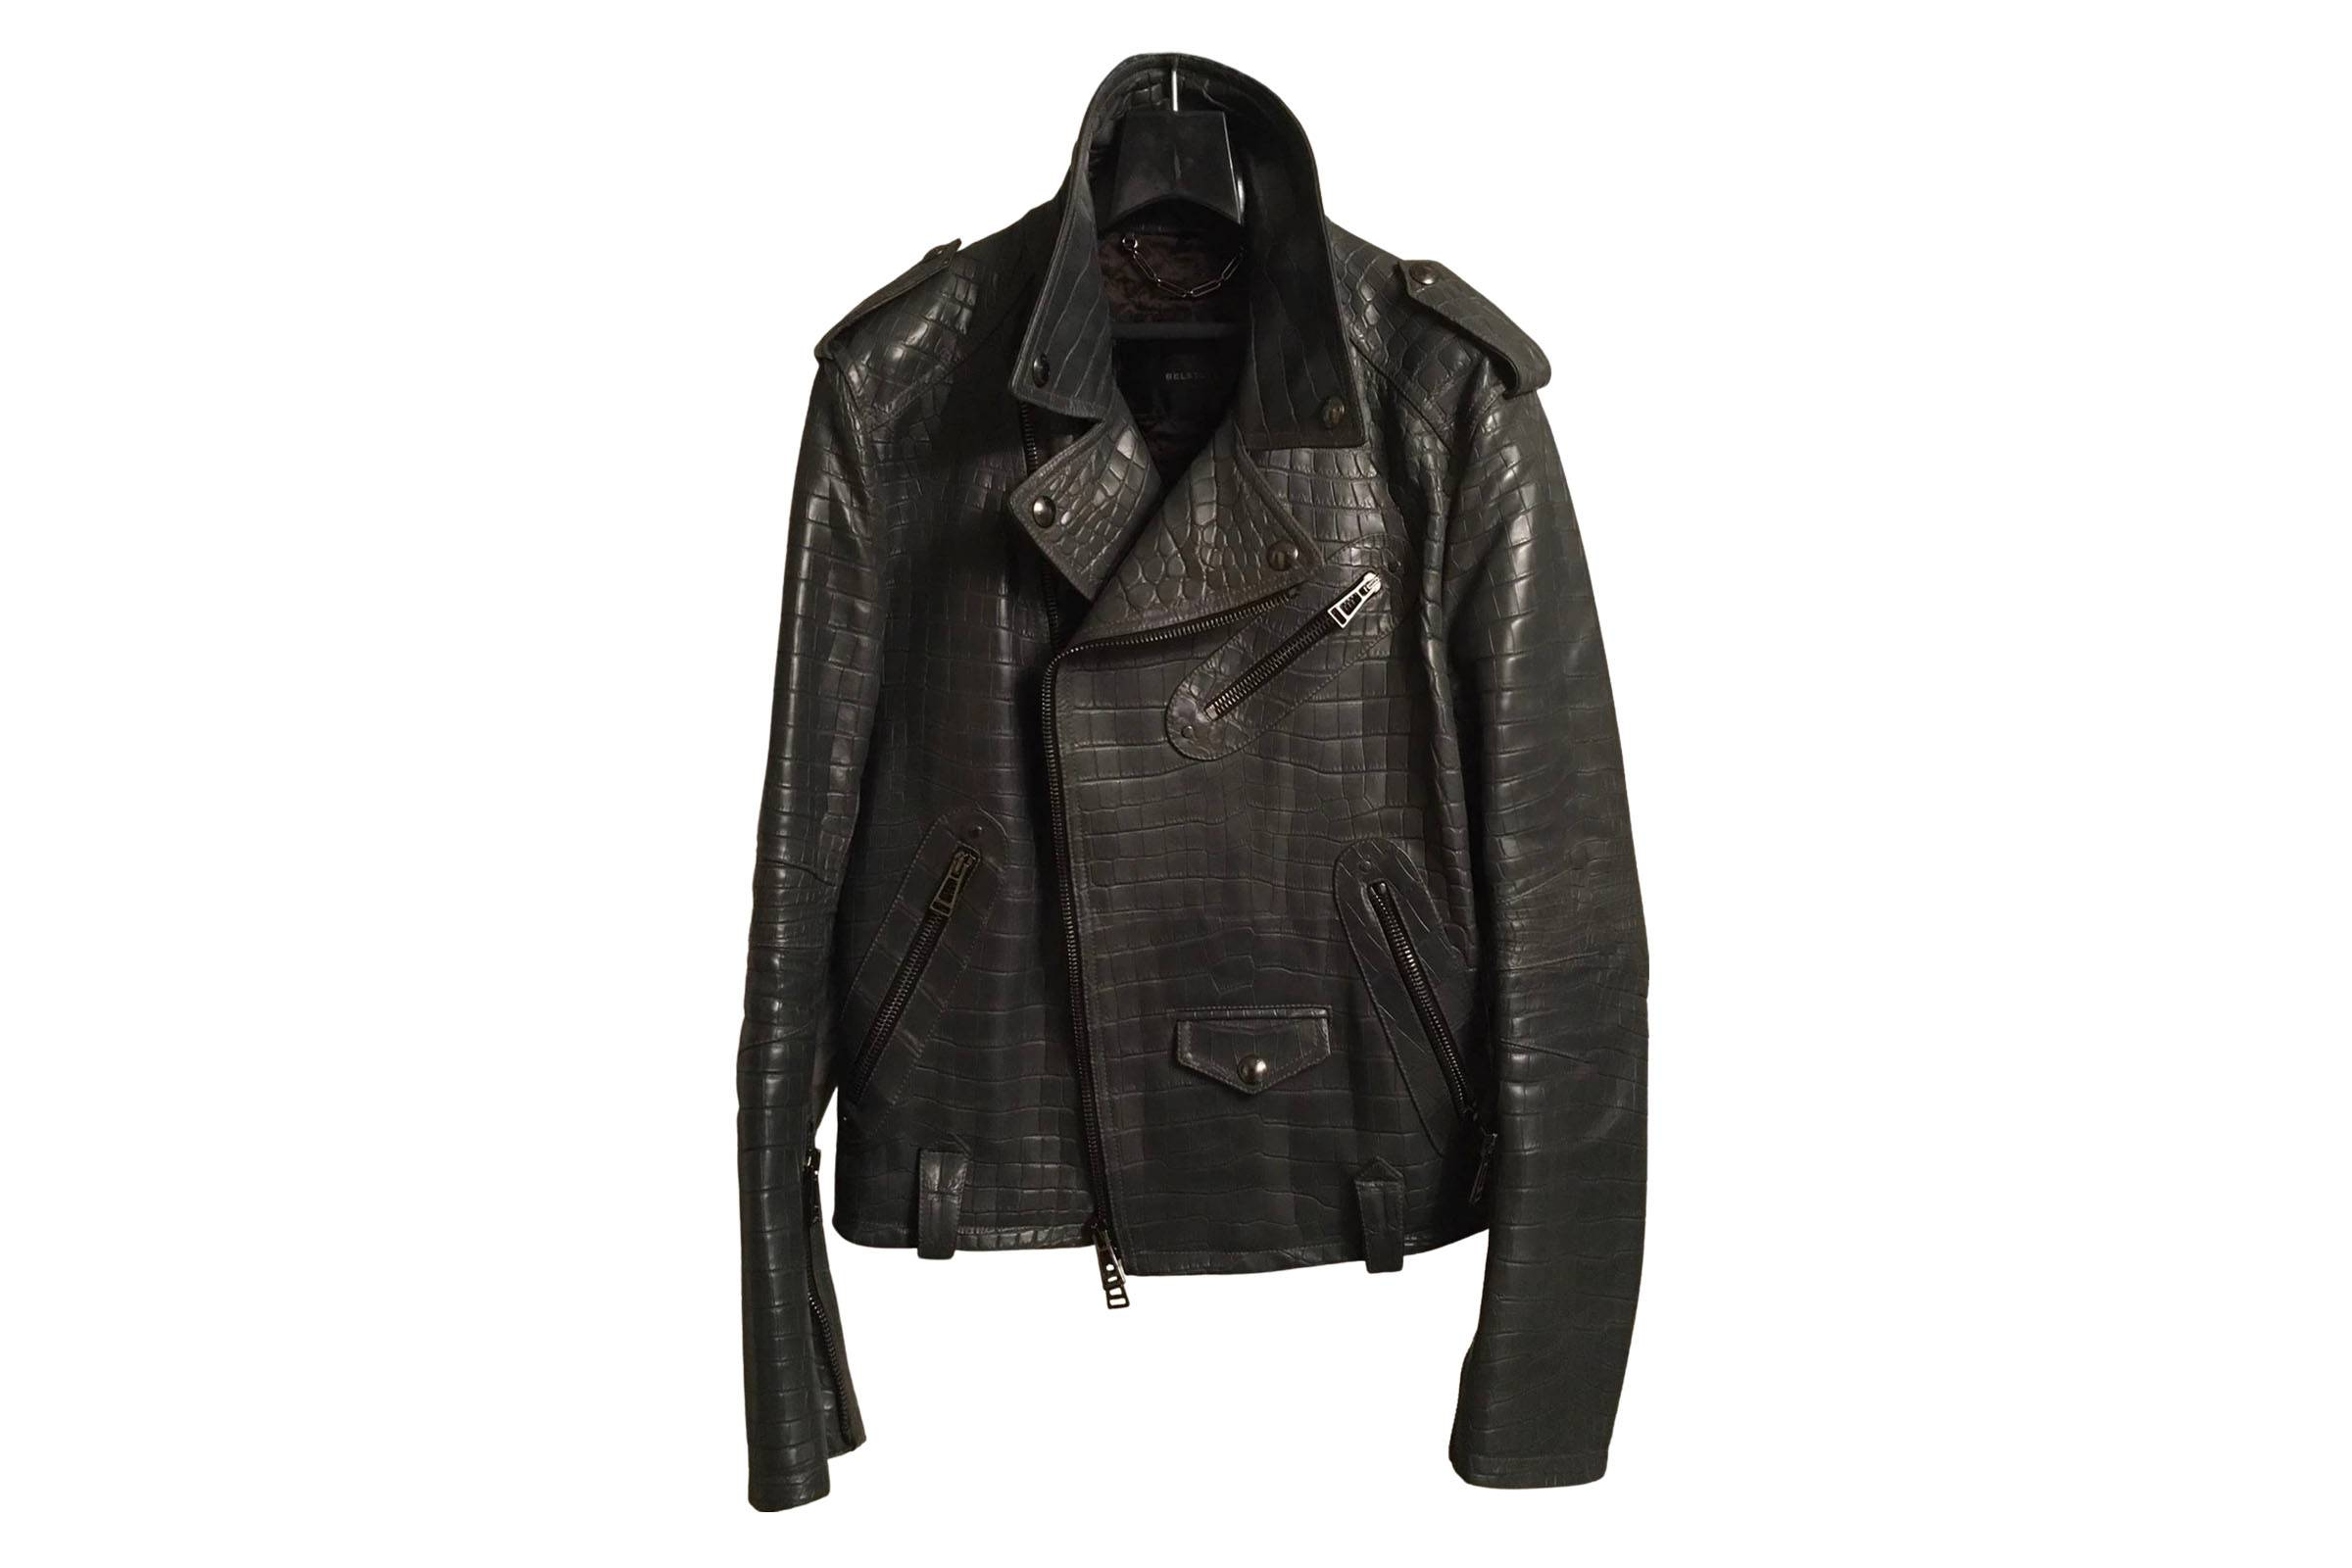 Belstaff Fall 2012 Crocodile Motorcycle Jacket